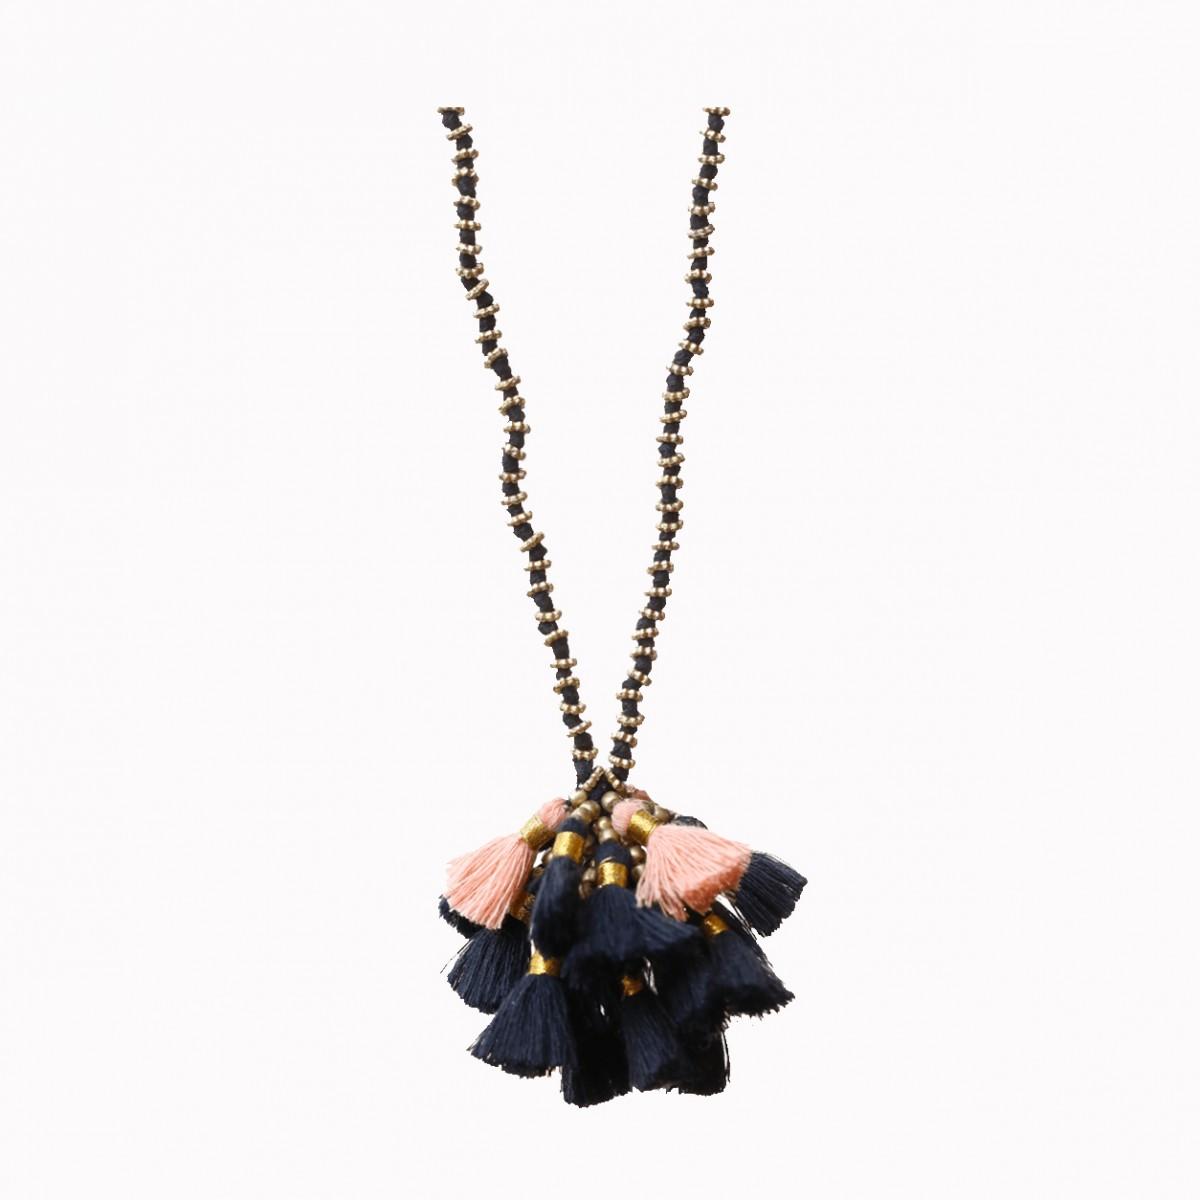 Bohemian Tassel Cluster Necklace - Black & Pink